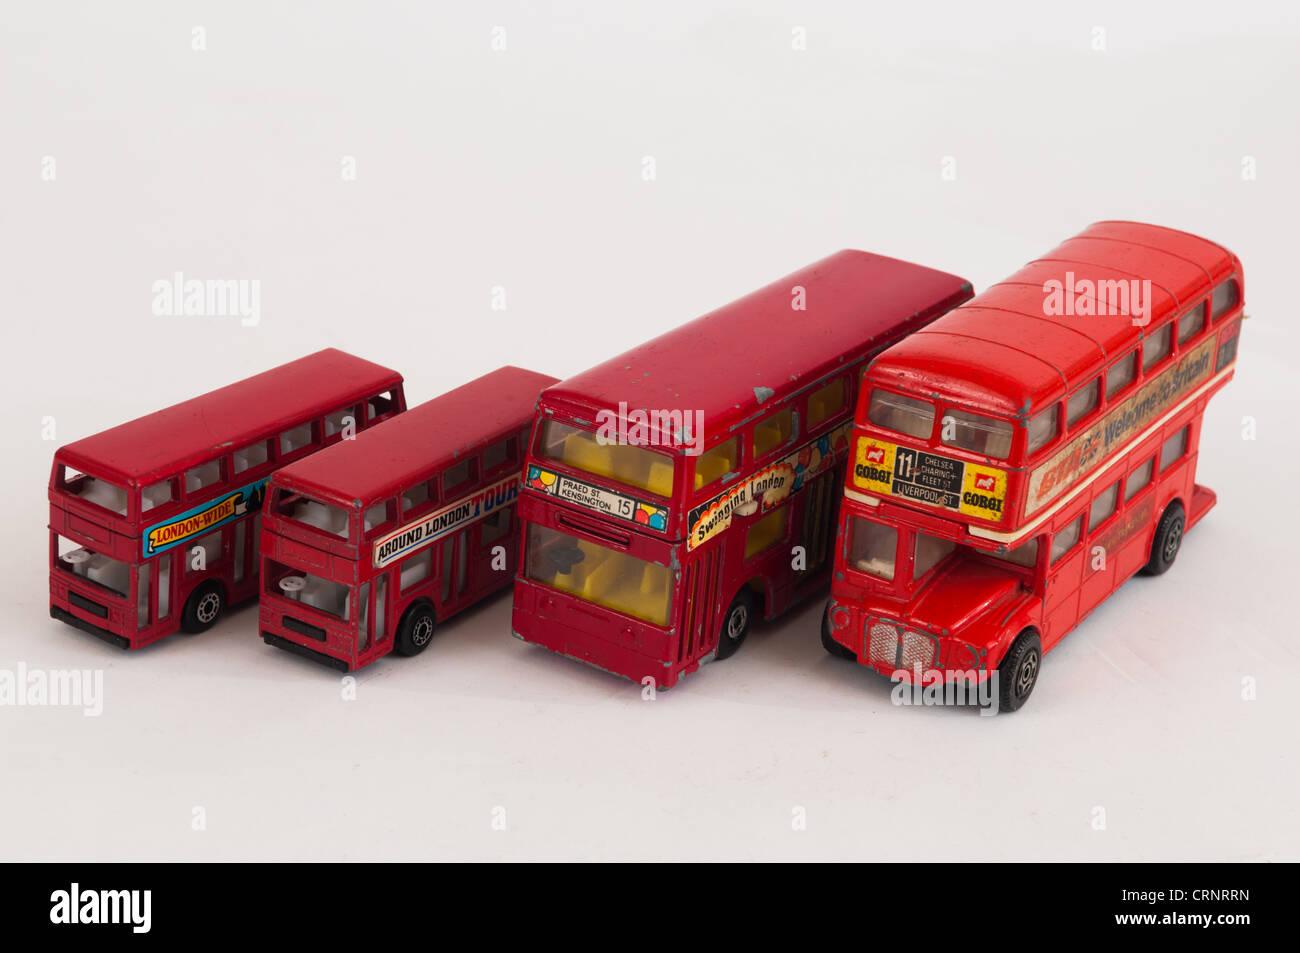 Colección de juguete diecast autobuses de Londres Imagen De Stock